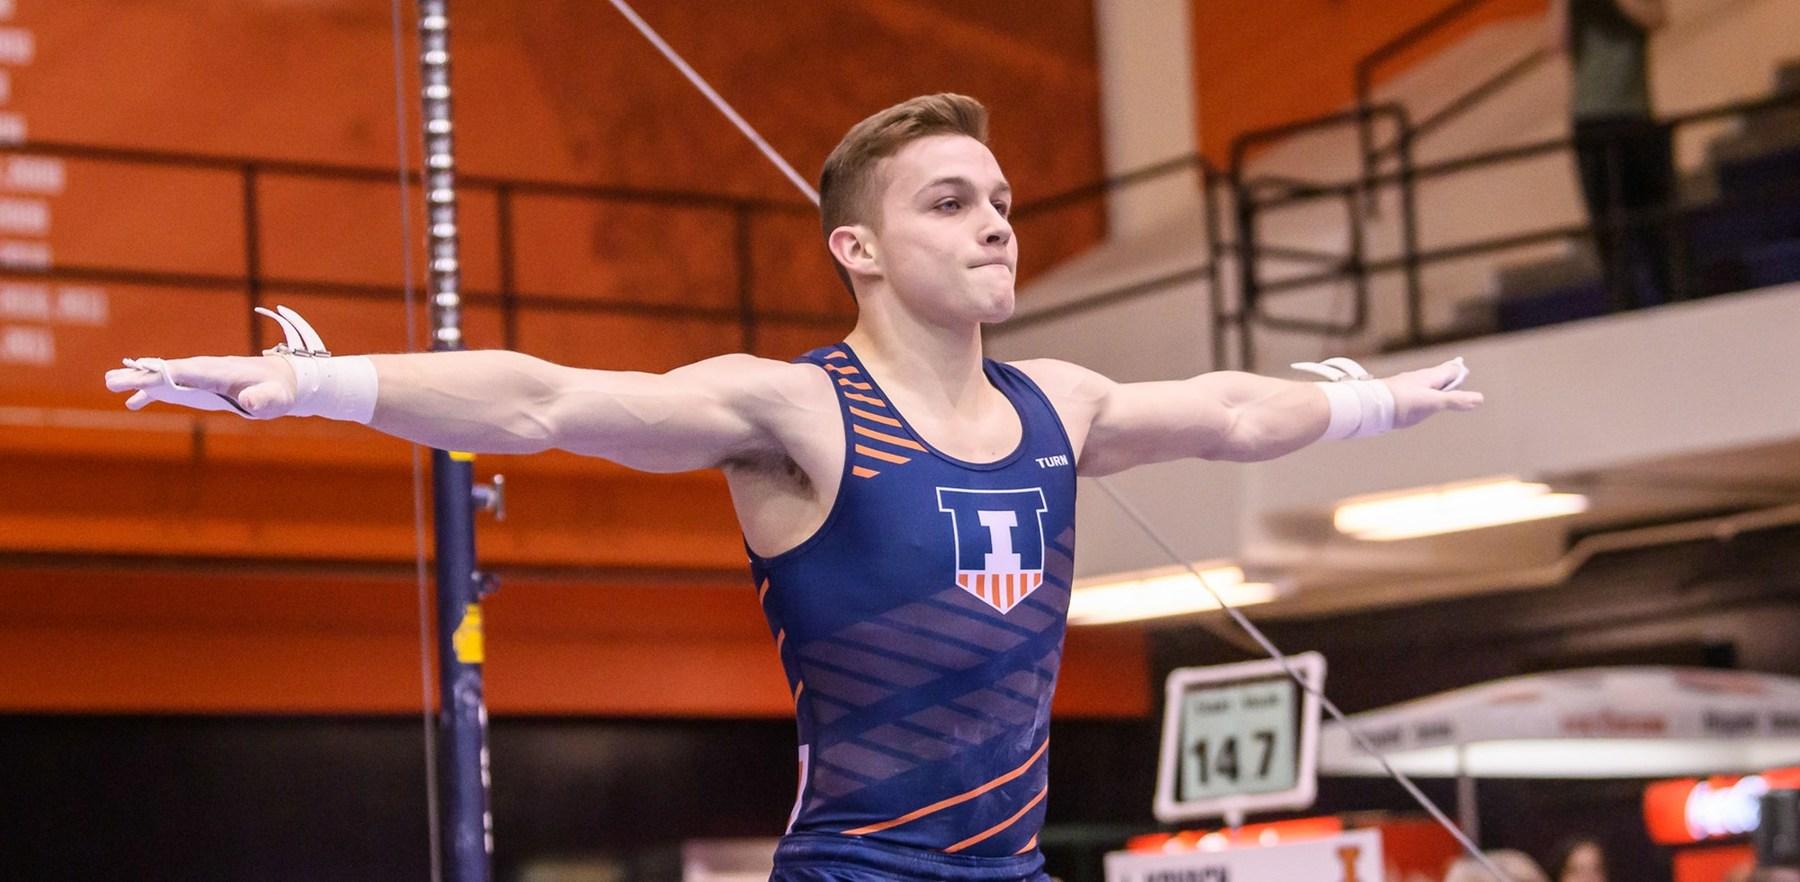 freshman gymnast Michael Fletcher